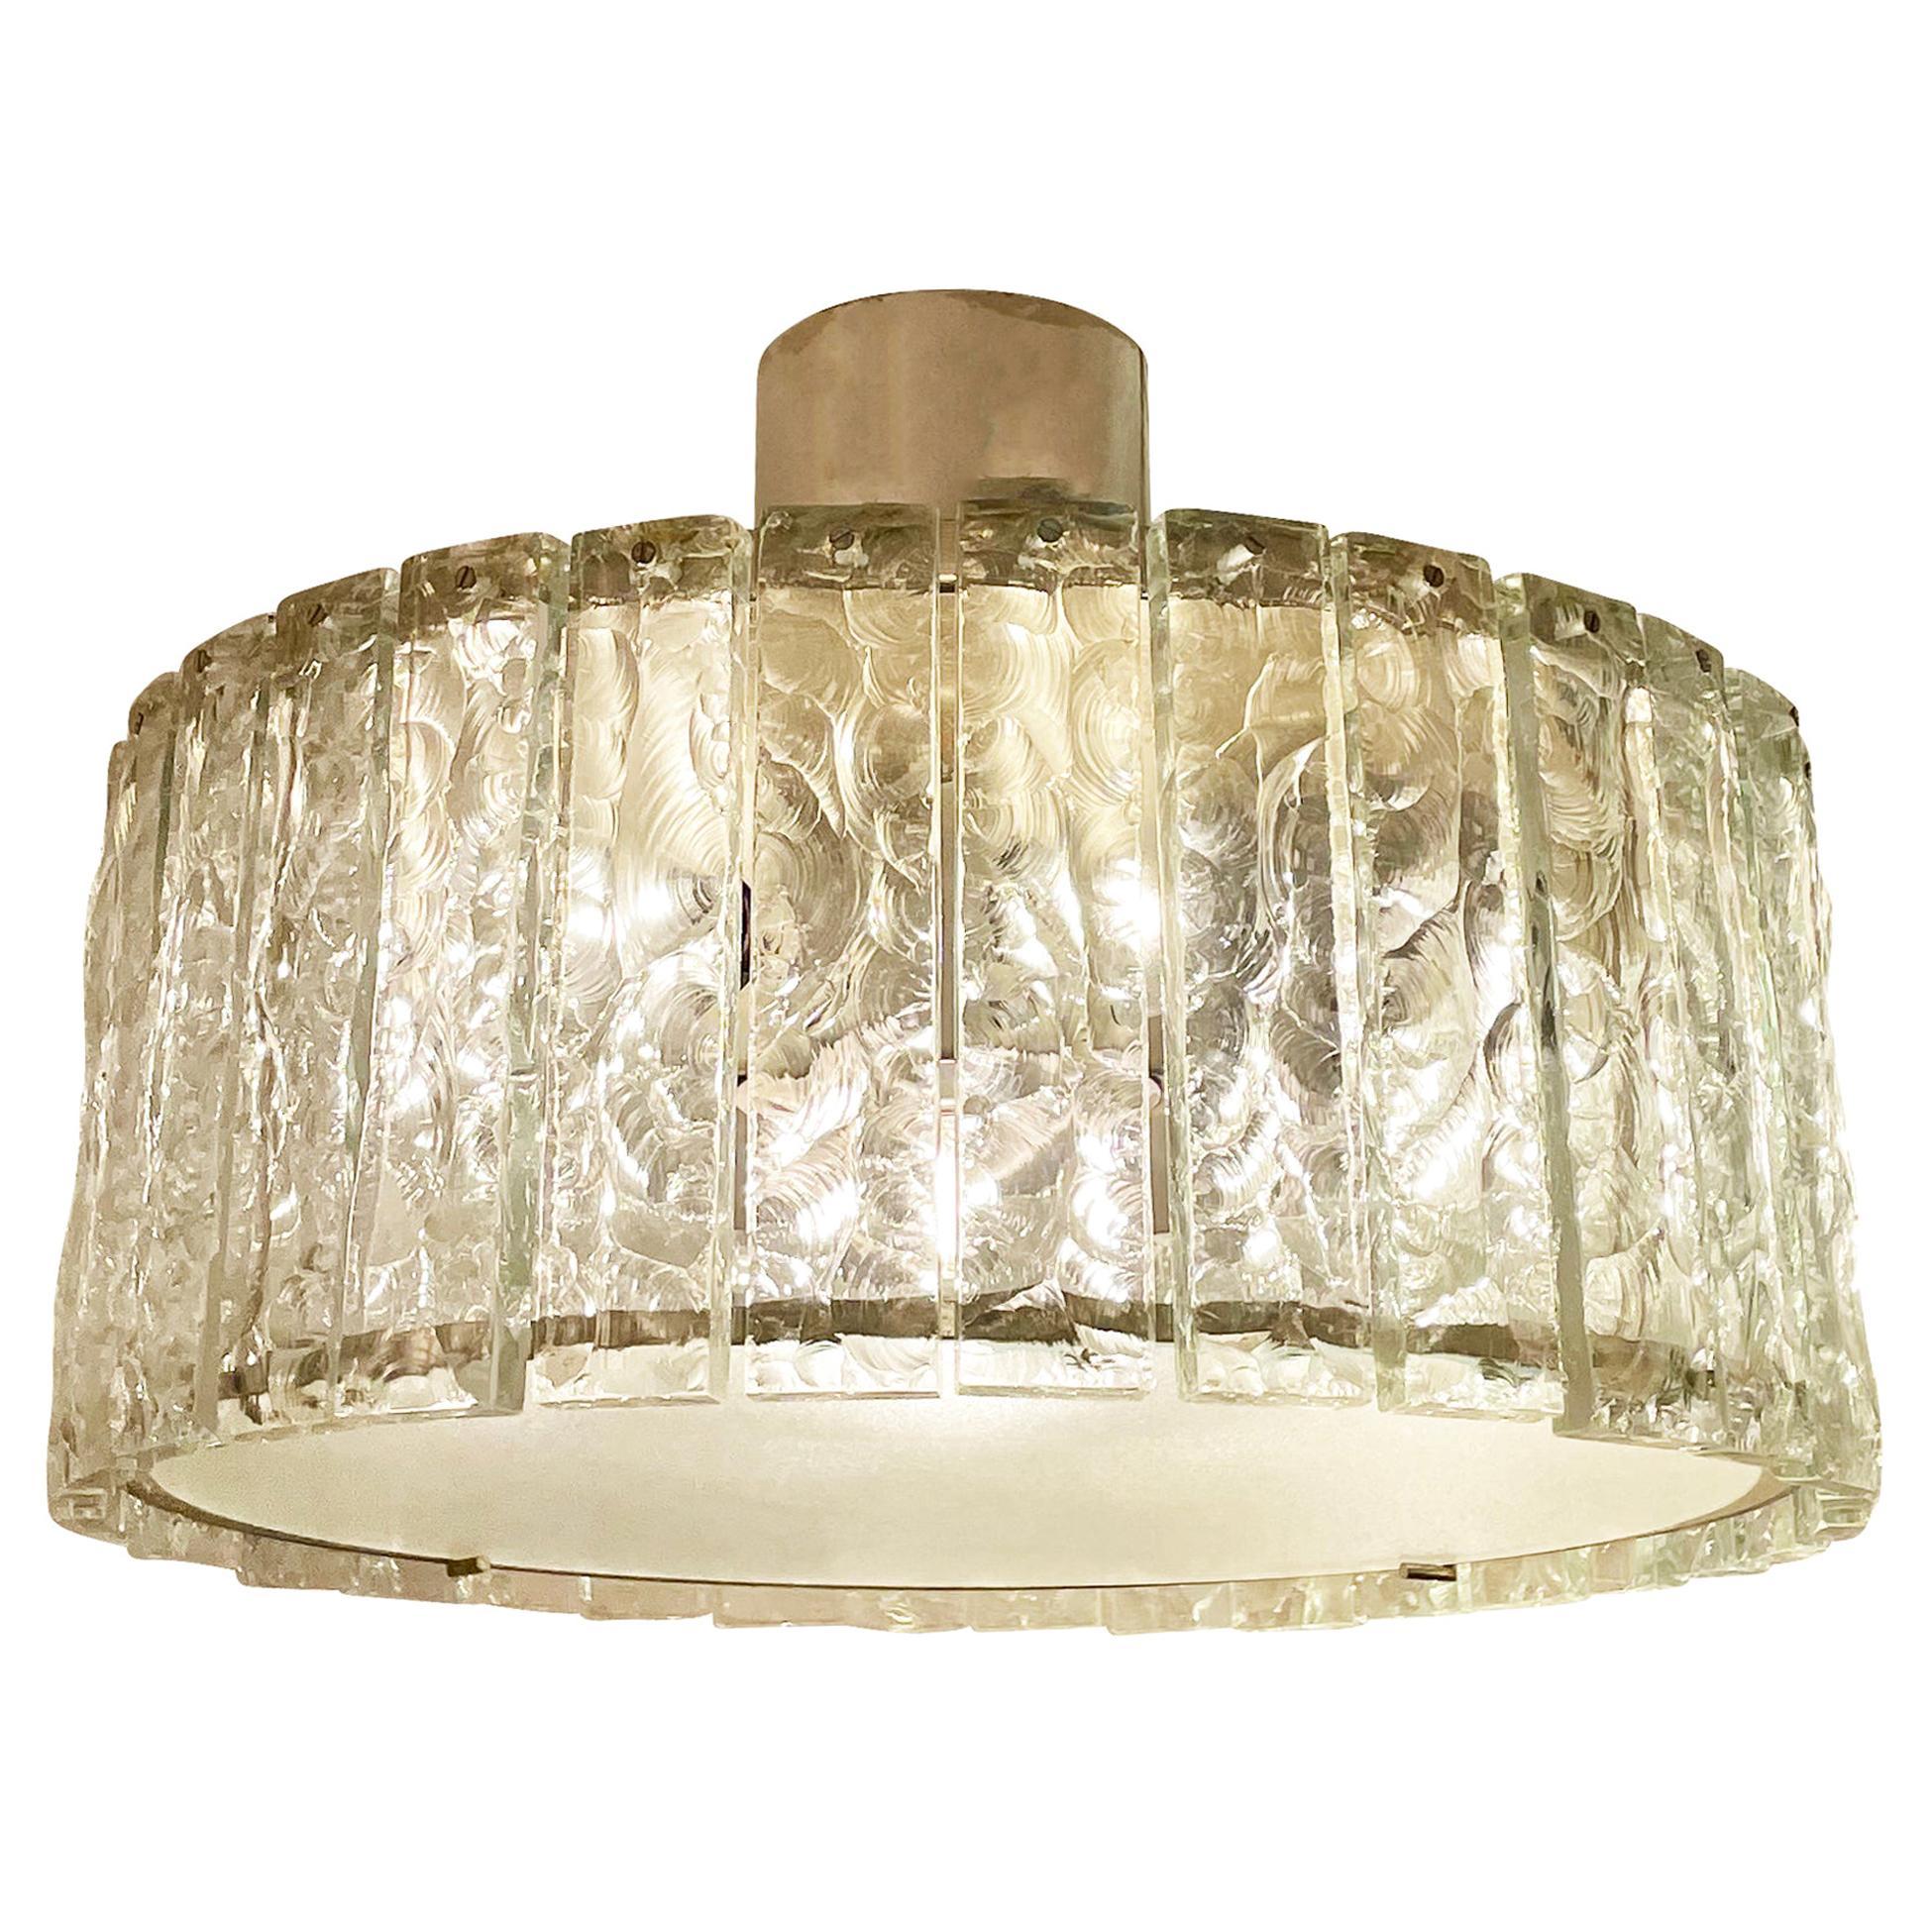 Fontana Arte Ceiling Light Model 2448 by Max Ingrand